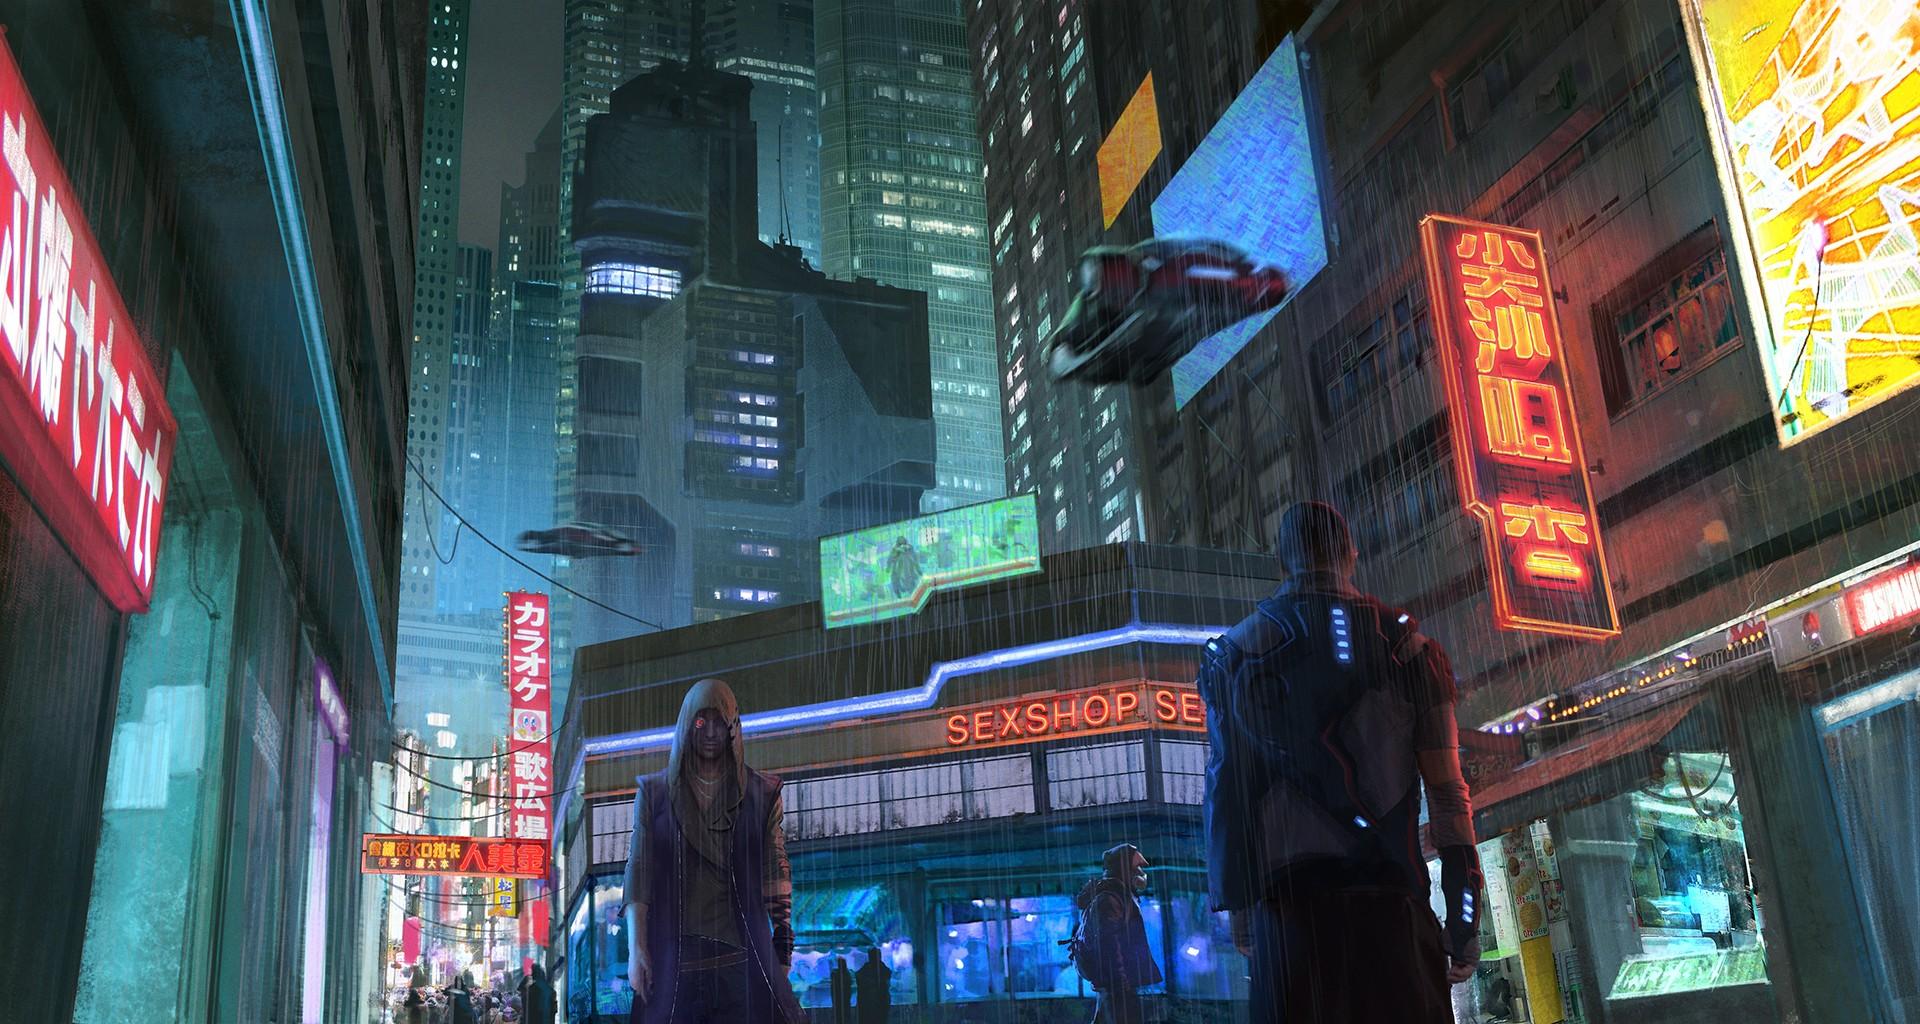 city-street-night-cyberpunk-neon-futuristic-road-metropolis-infrastructure-color-downtown-urban-area-170638.jpg